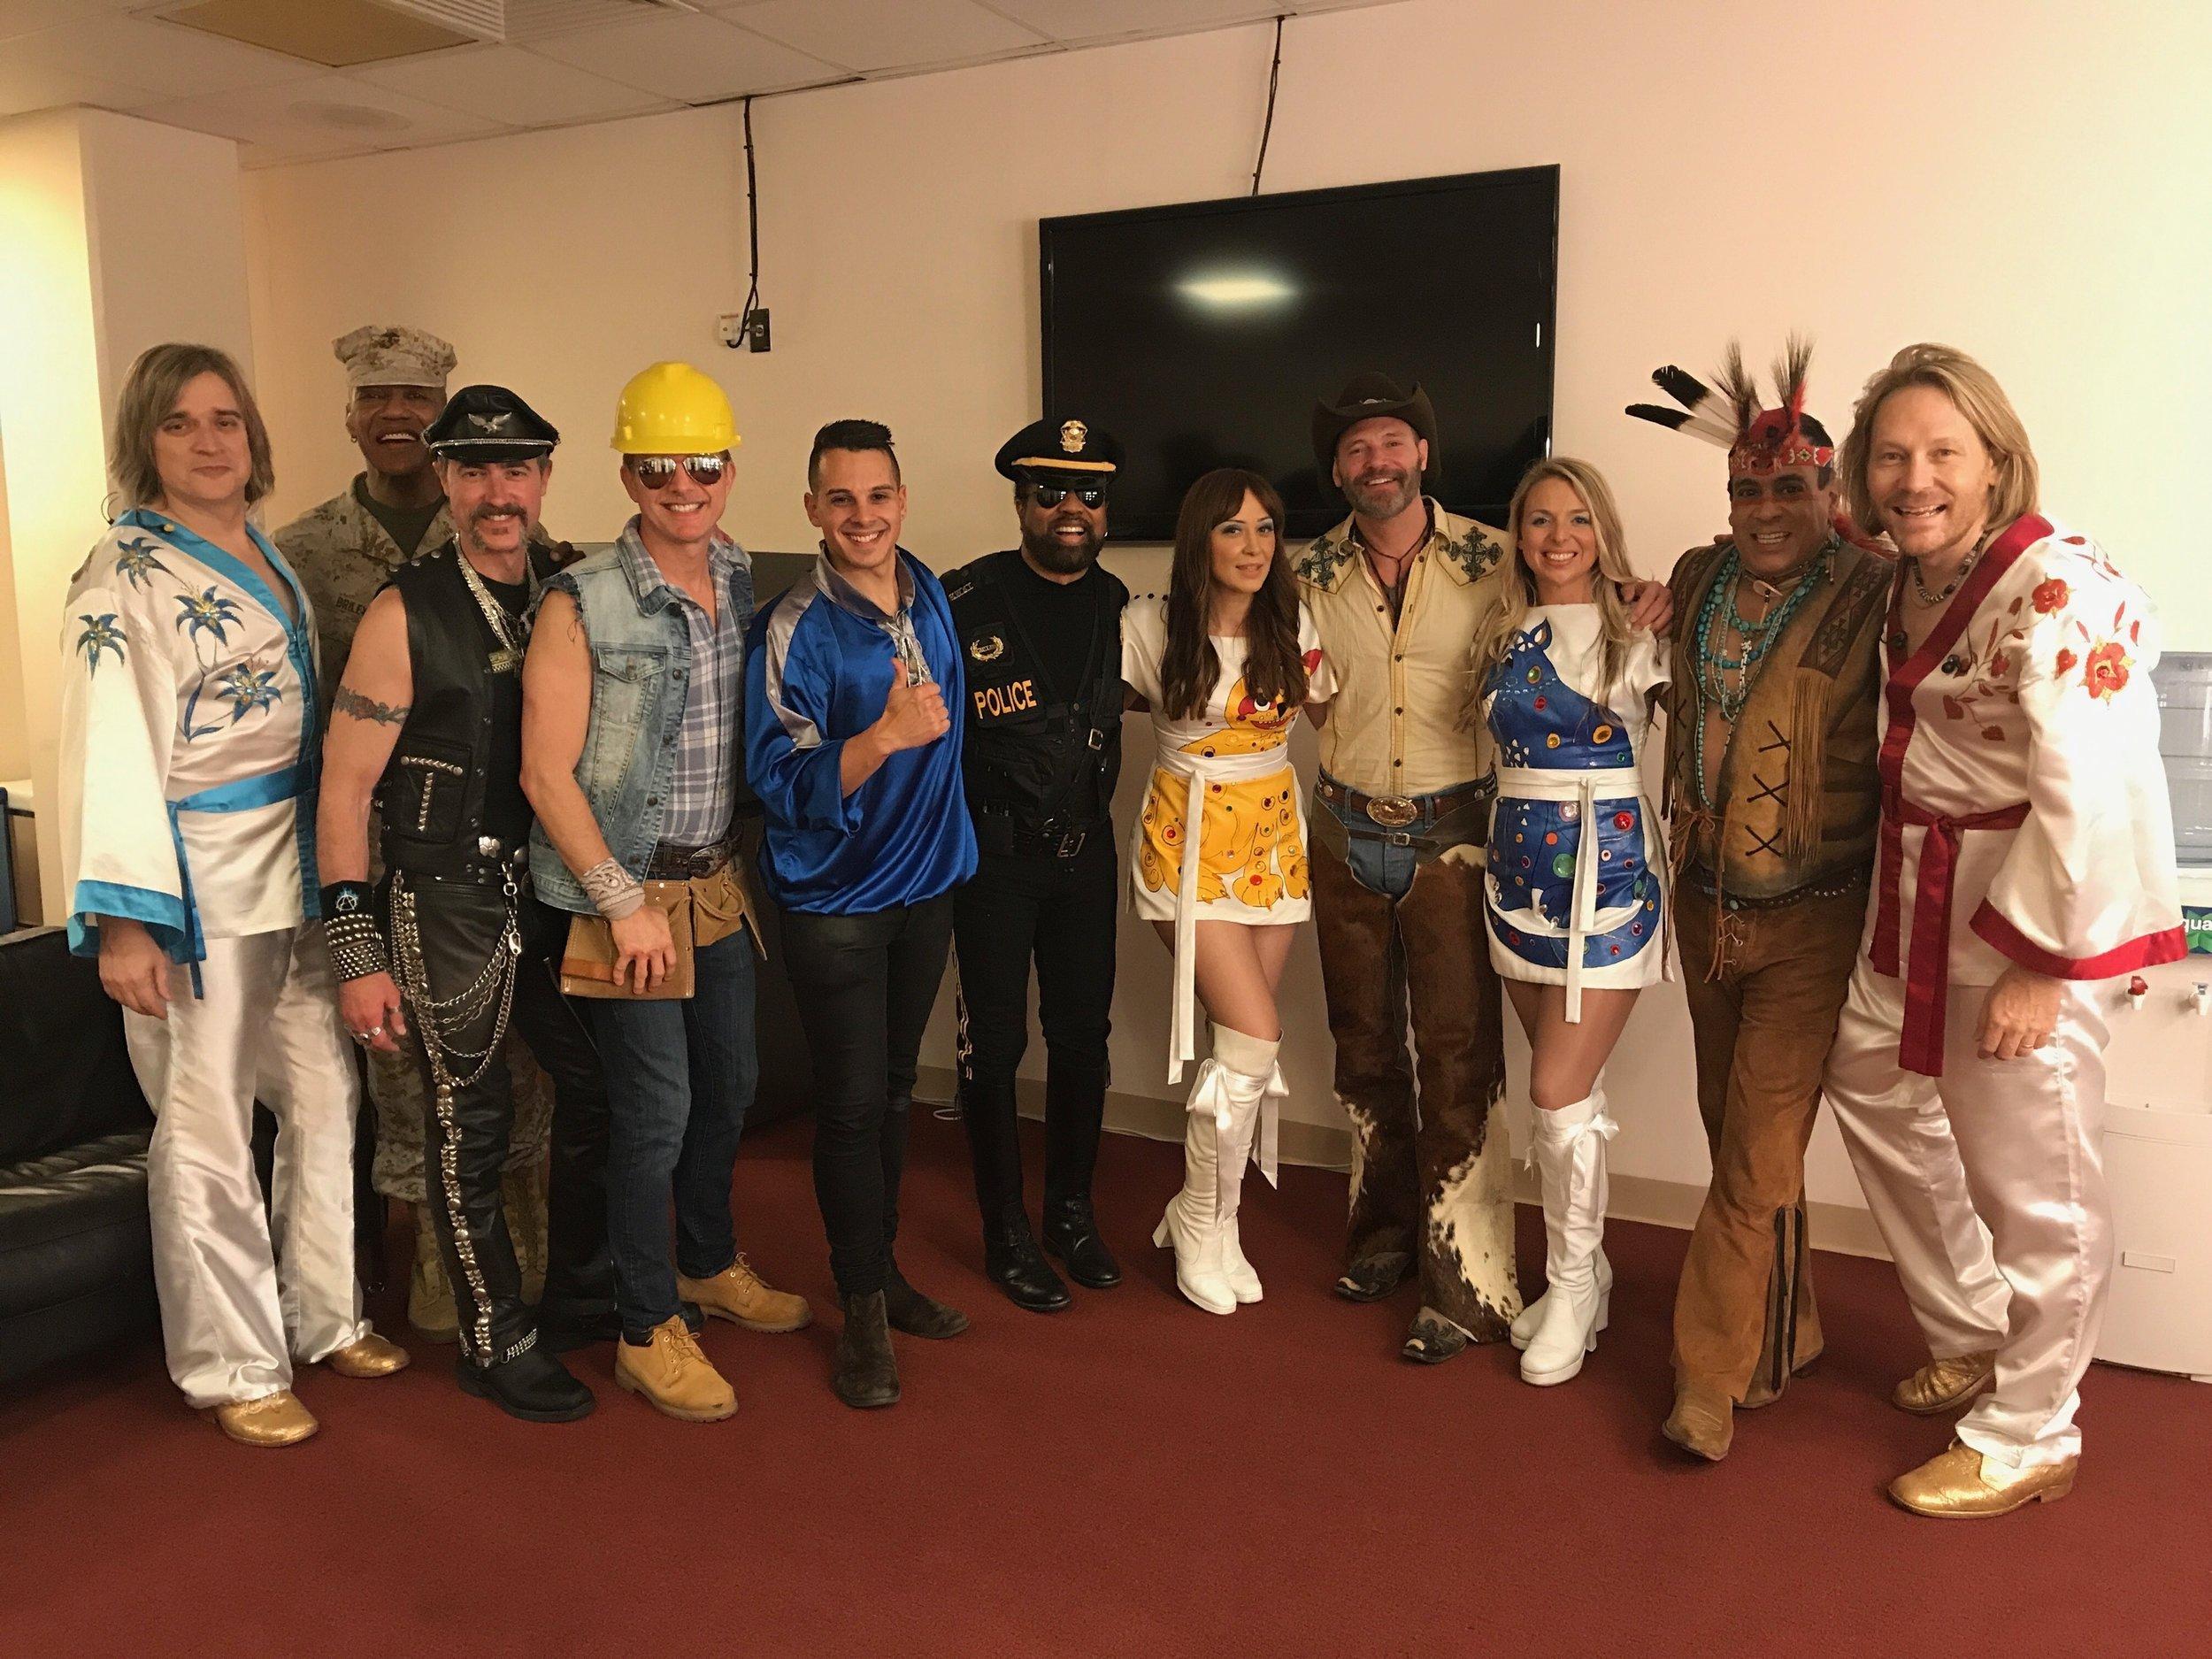 Bjorn Again and The Village People Tour Australasia